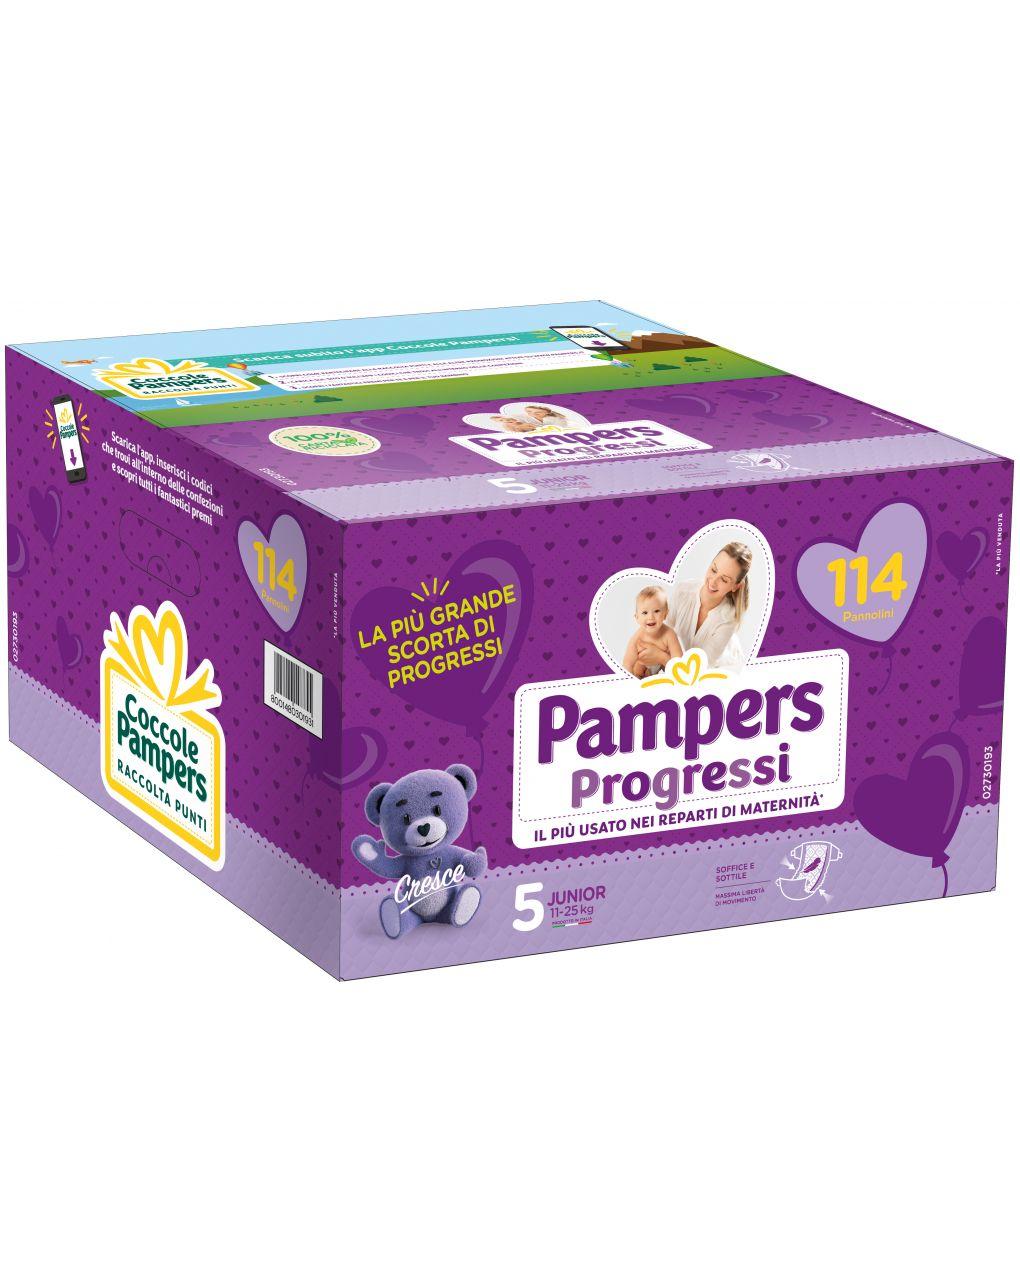 Pampers - pannolini progressi esapack tg. 5 (114 pz) - Pampers